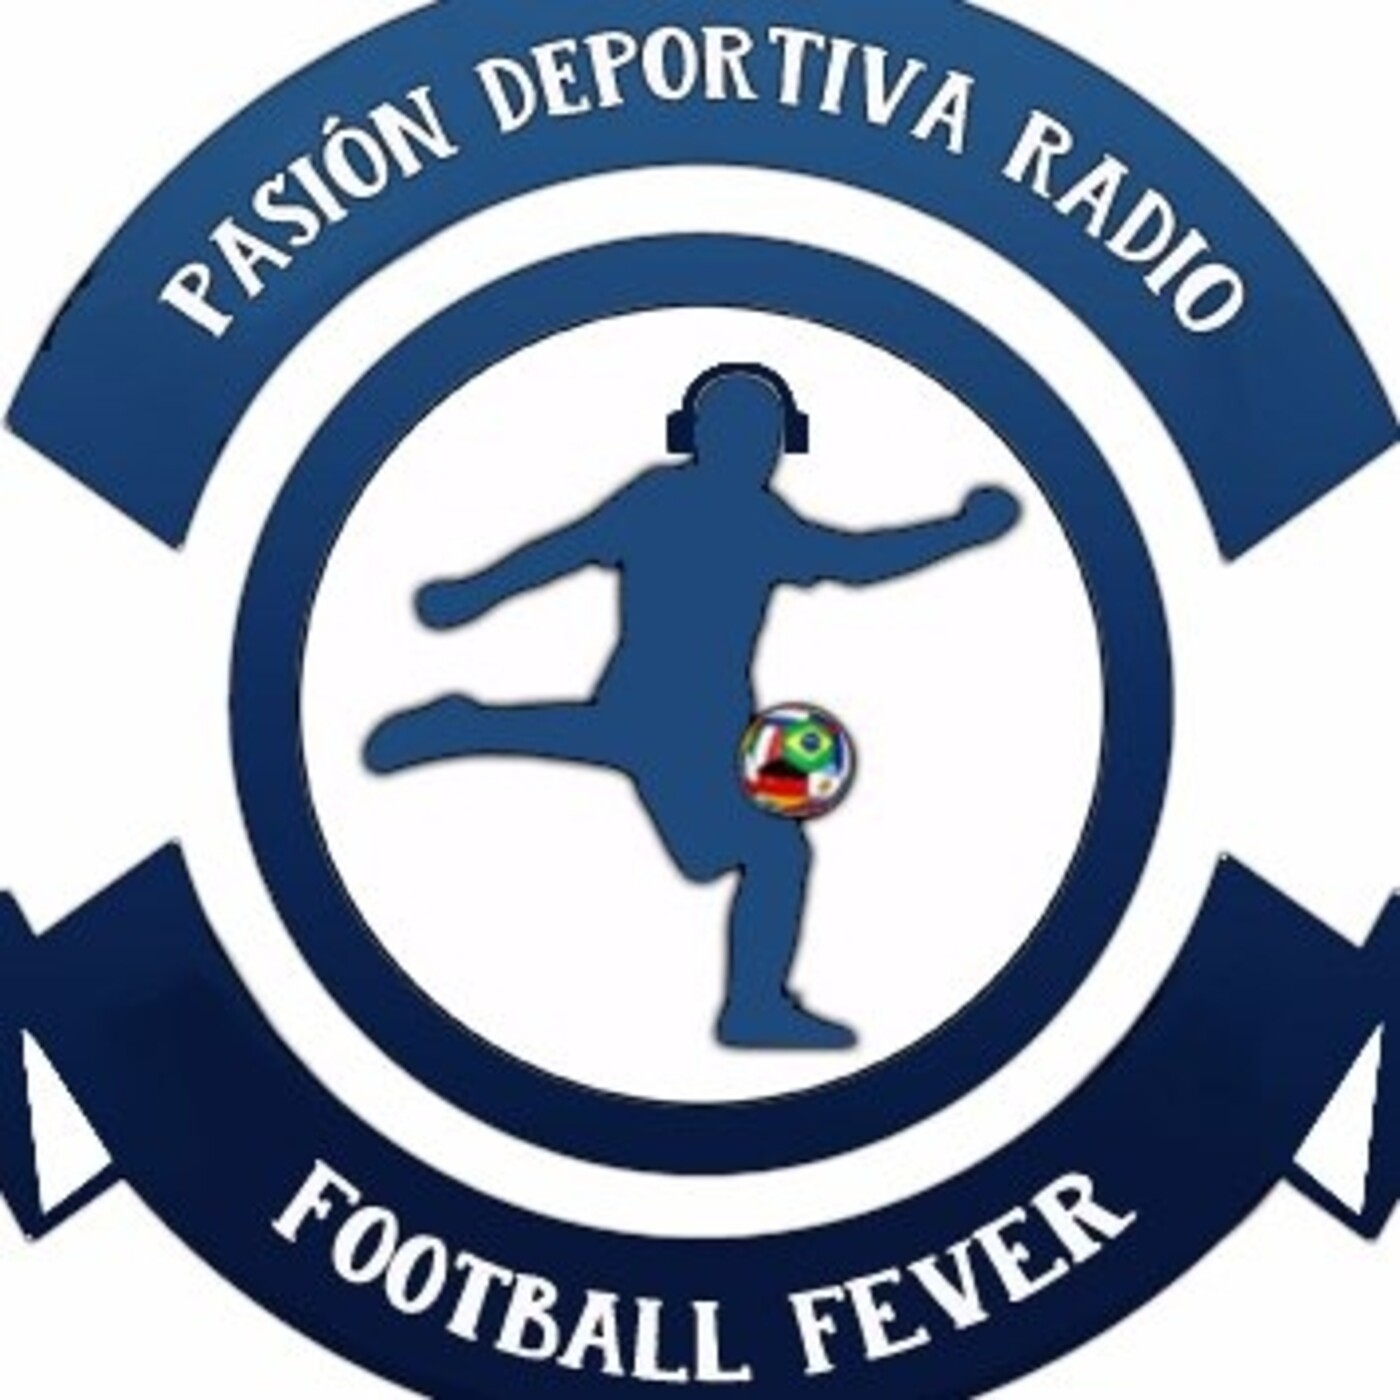 Football Fever 9x12: No solamente lo breve es dos veces bueno